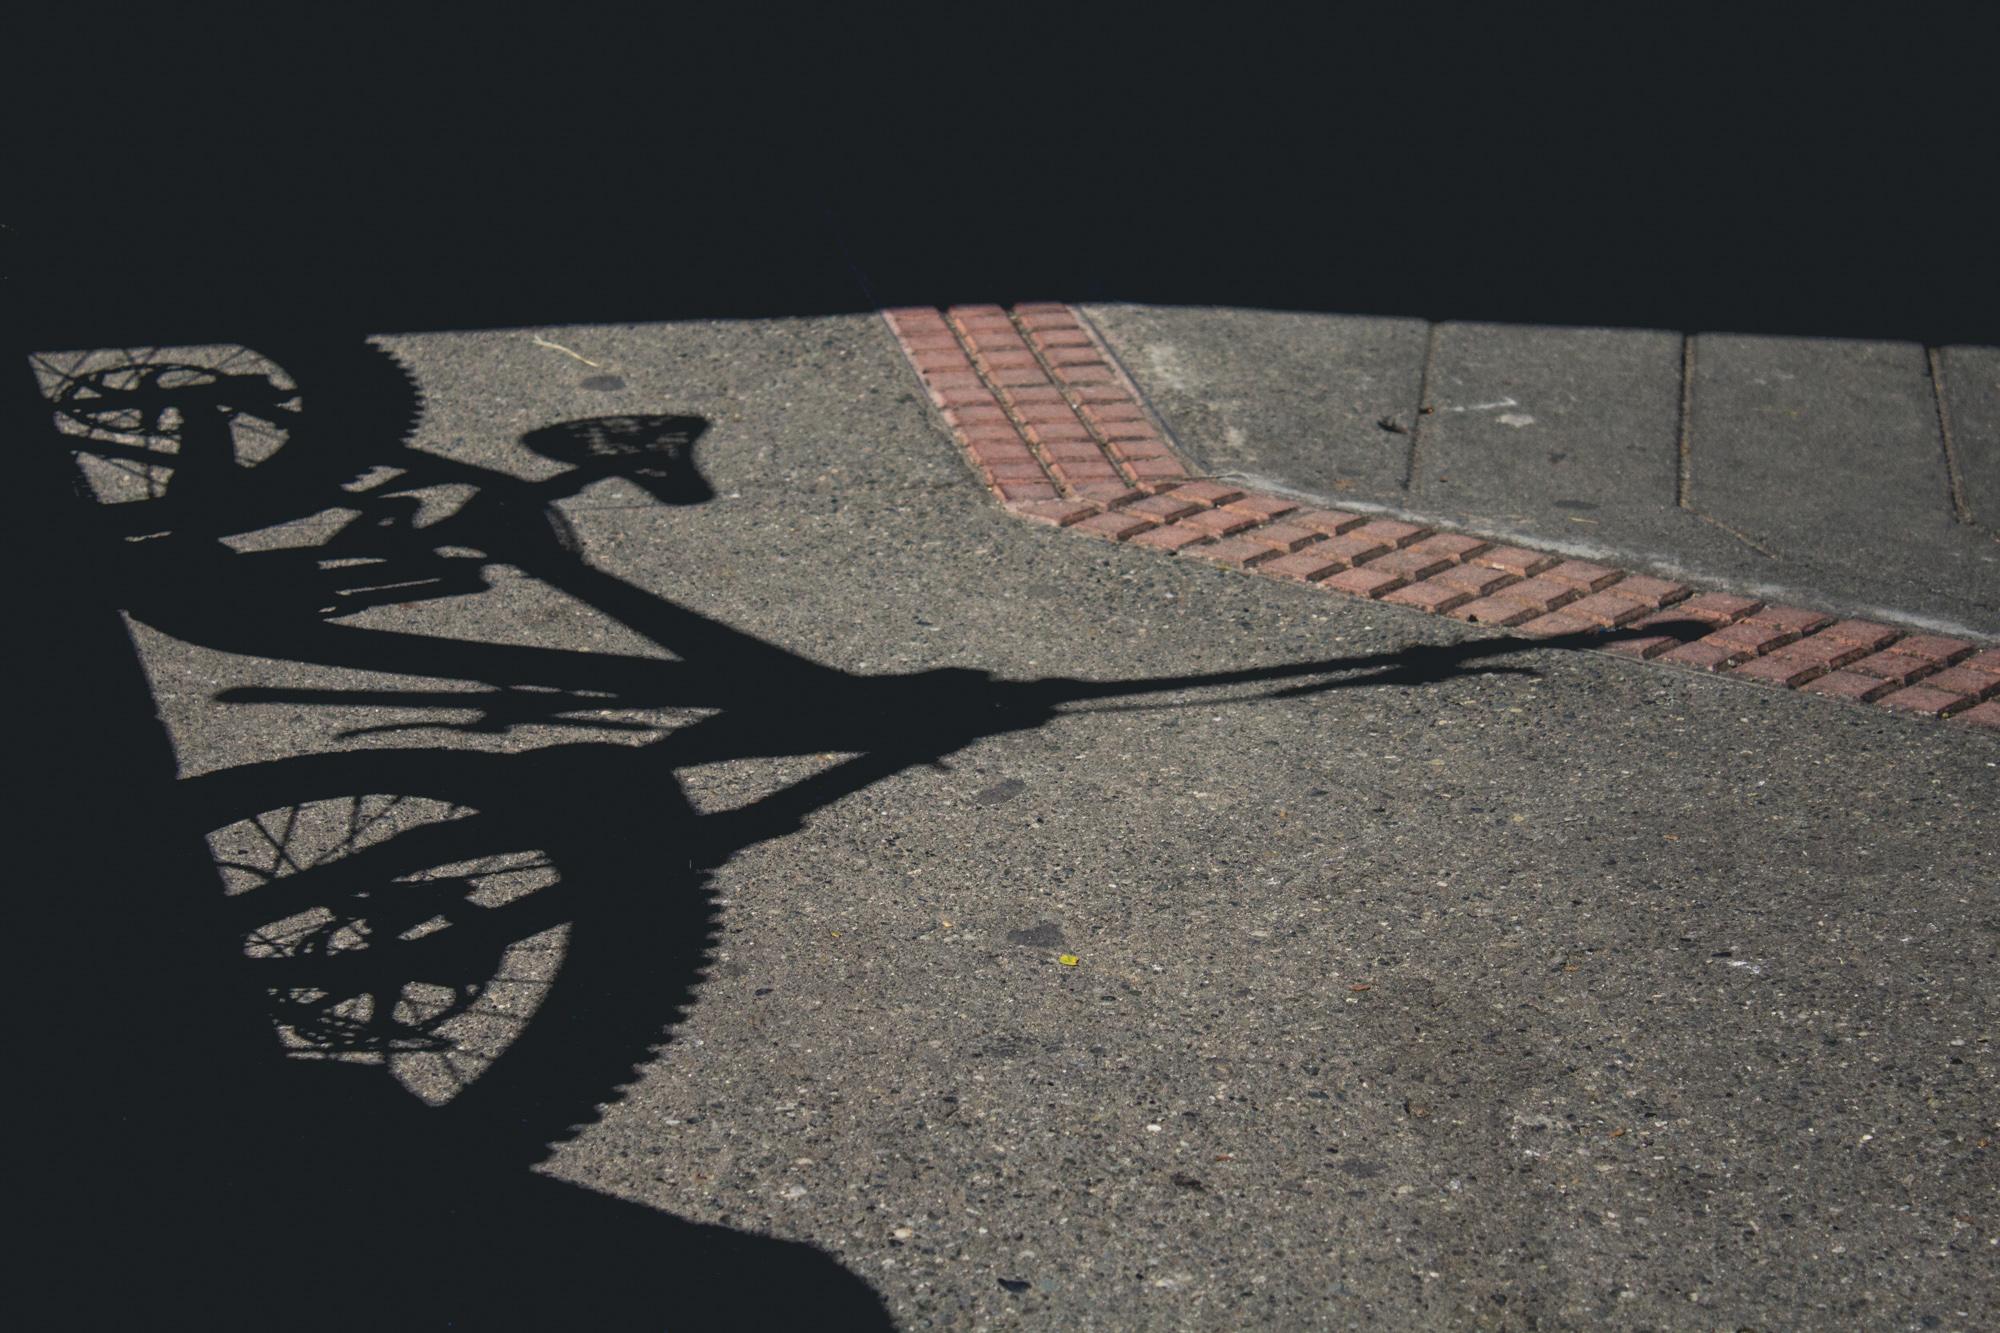 Daunjilero_Adrenalina_Urban_Daniel